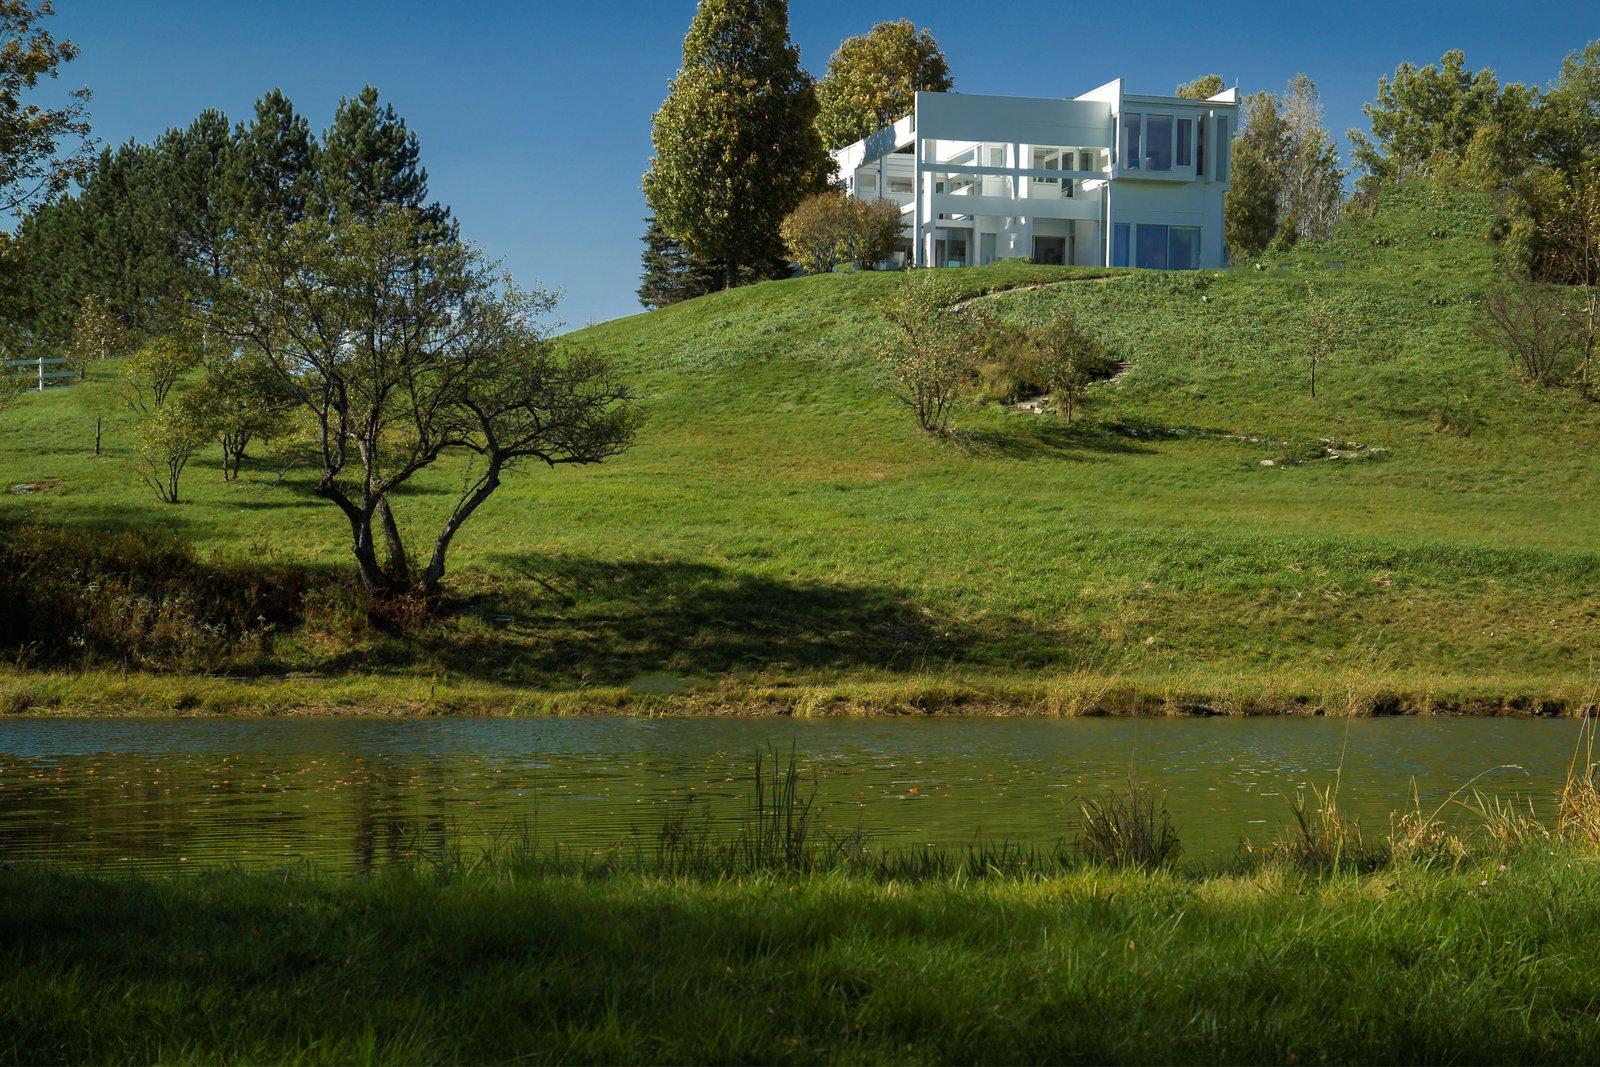 House II / Falk House: View across the pond  House II / Falk House by Devin Colman